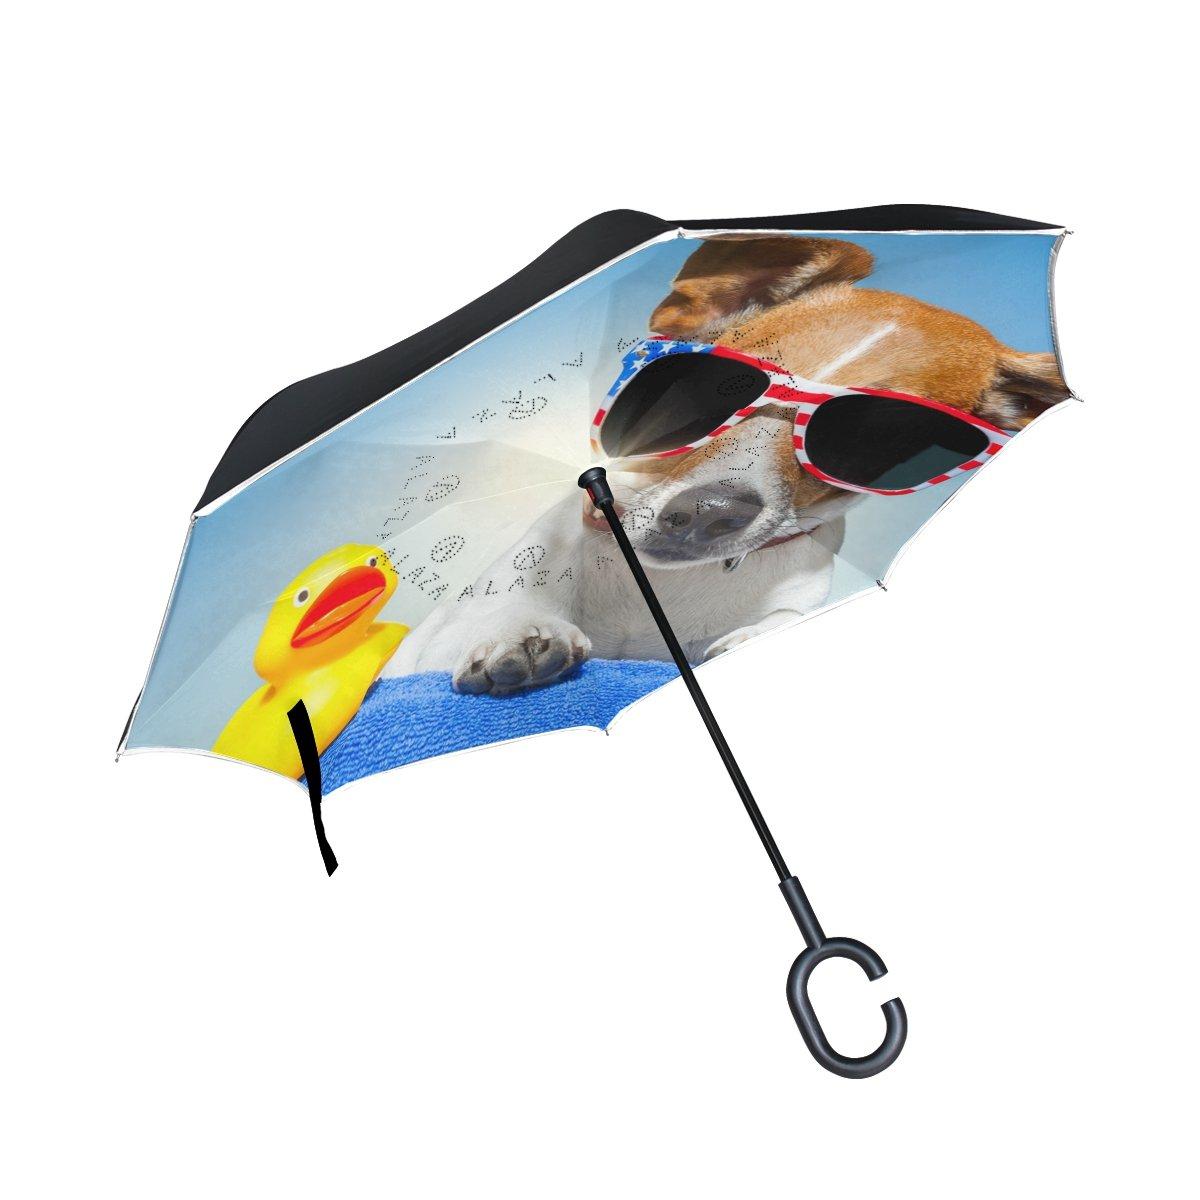 My Daily Double Layer Inverted傘Cars逆傘犬Duck Summer Vacation防風UVプルーフ旅行アウトドア傘   B07FCP7HHX